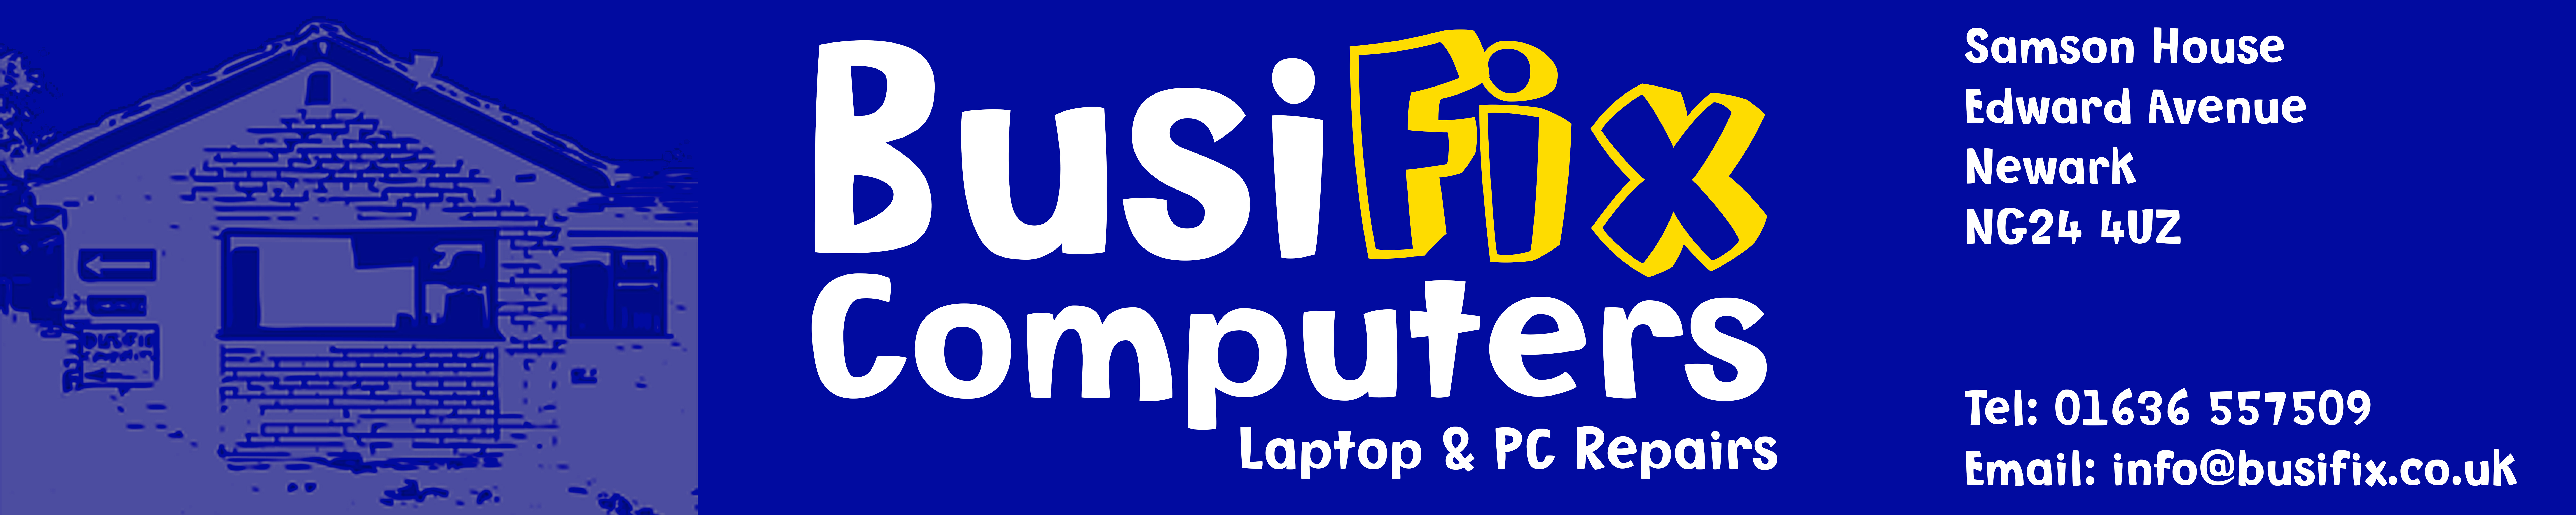 BusiFix Computers